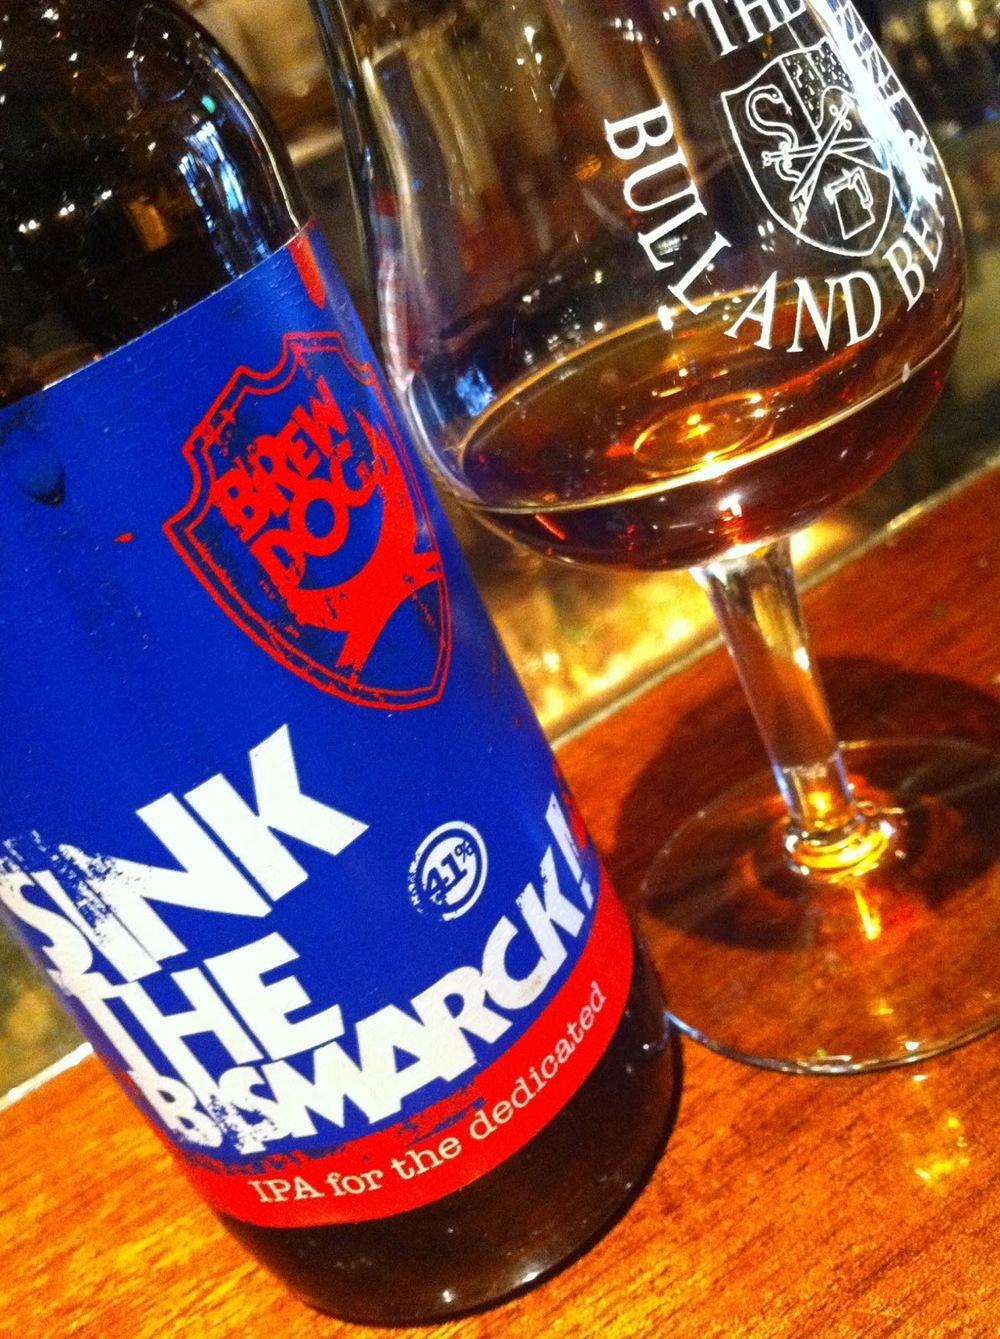 Brewdog Sink The Bismarck